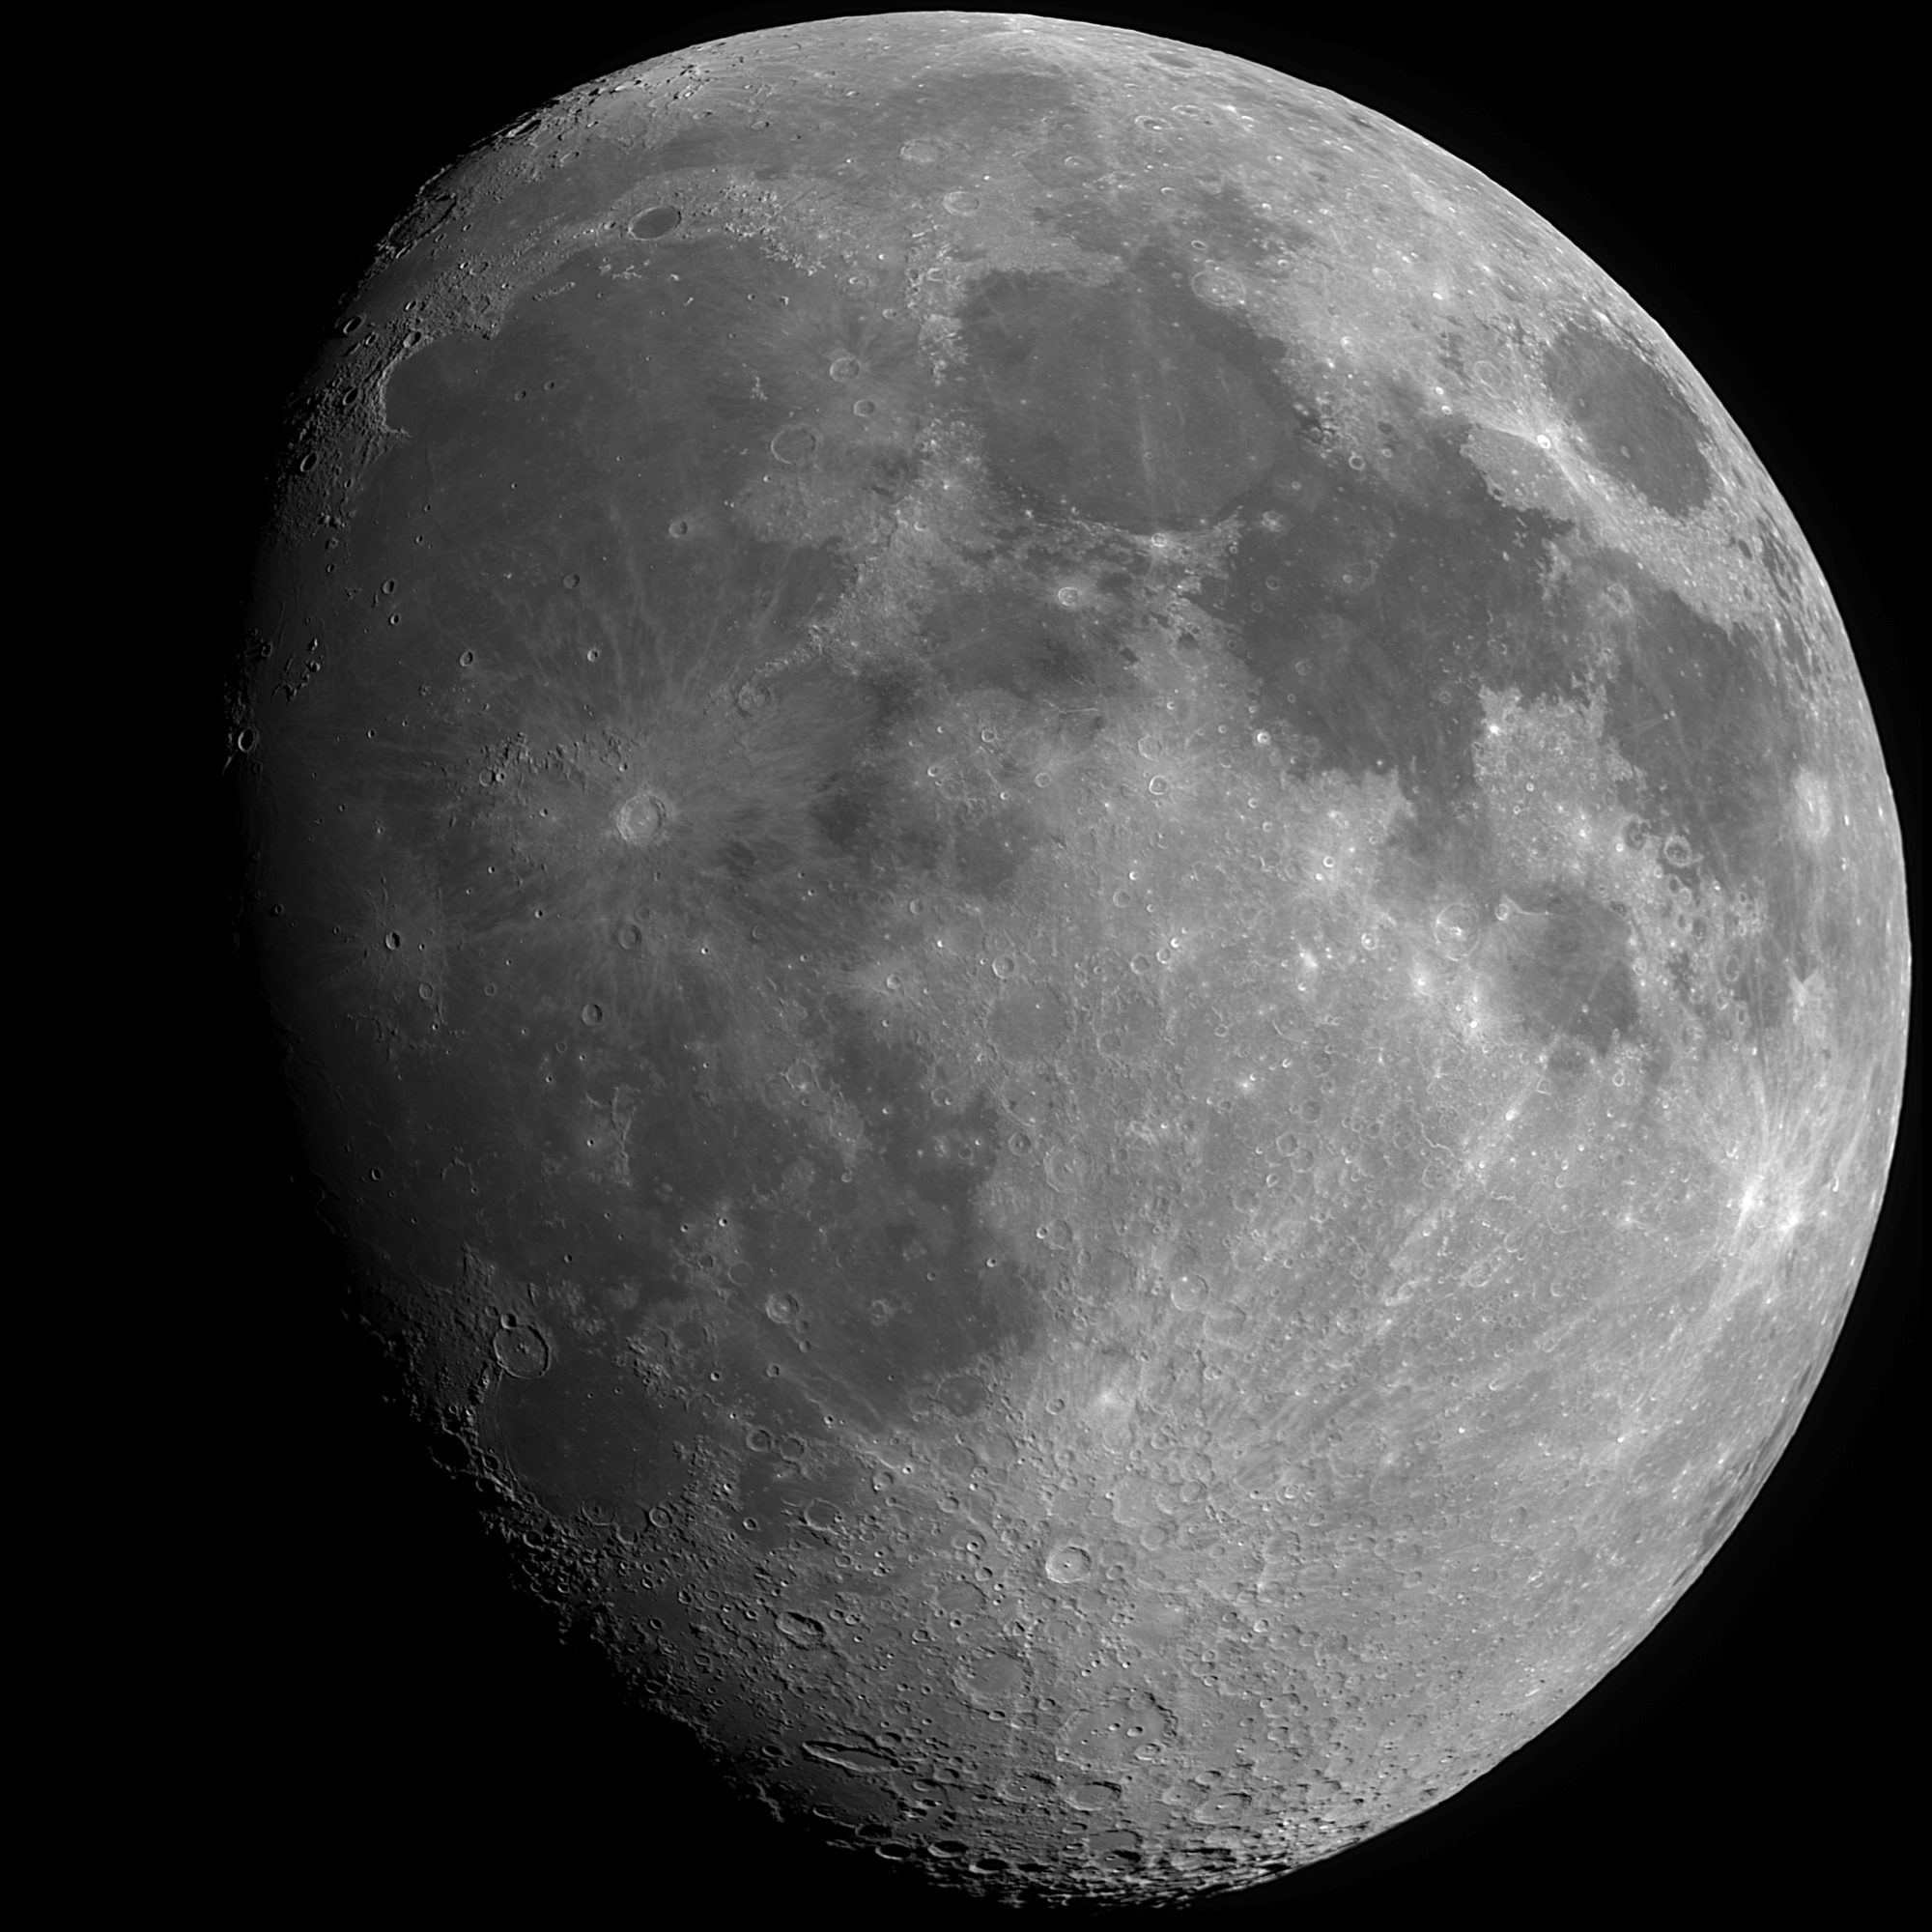 lune_2020_04_04_12_tuiles.thumb.jpg.2f6382ed0265fbea498ba6c8624edf9b.jpg